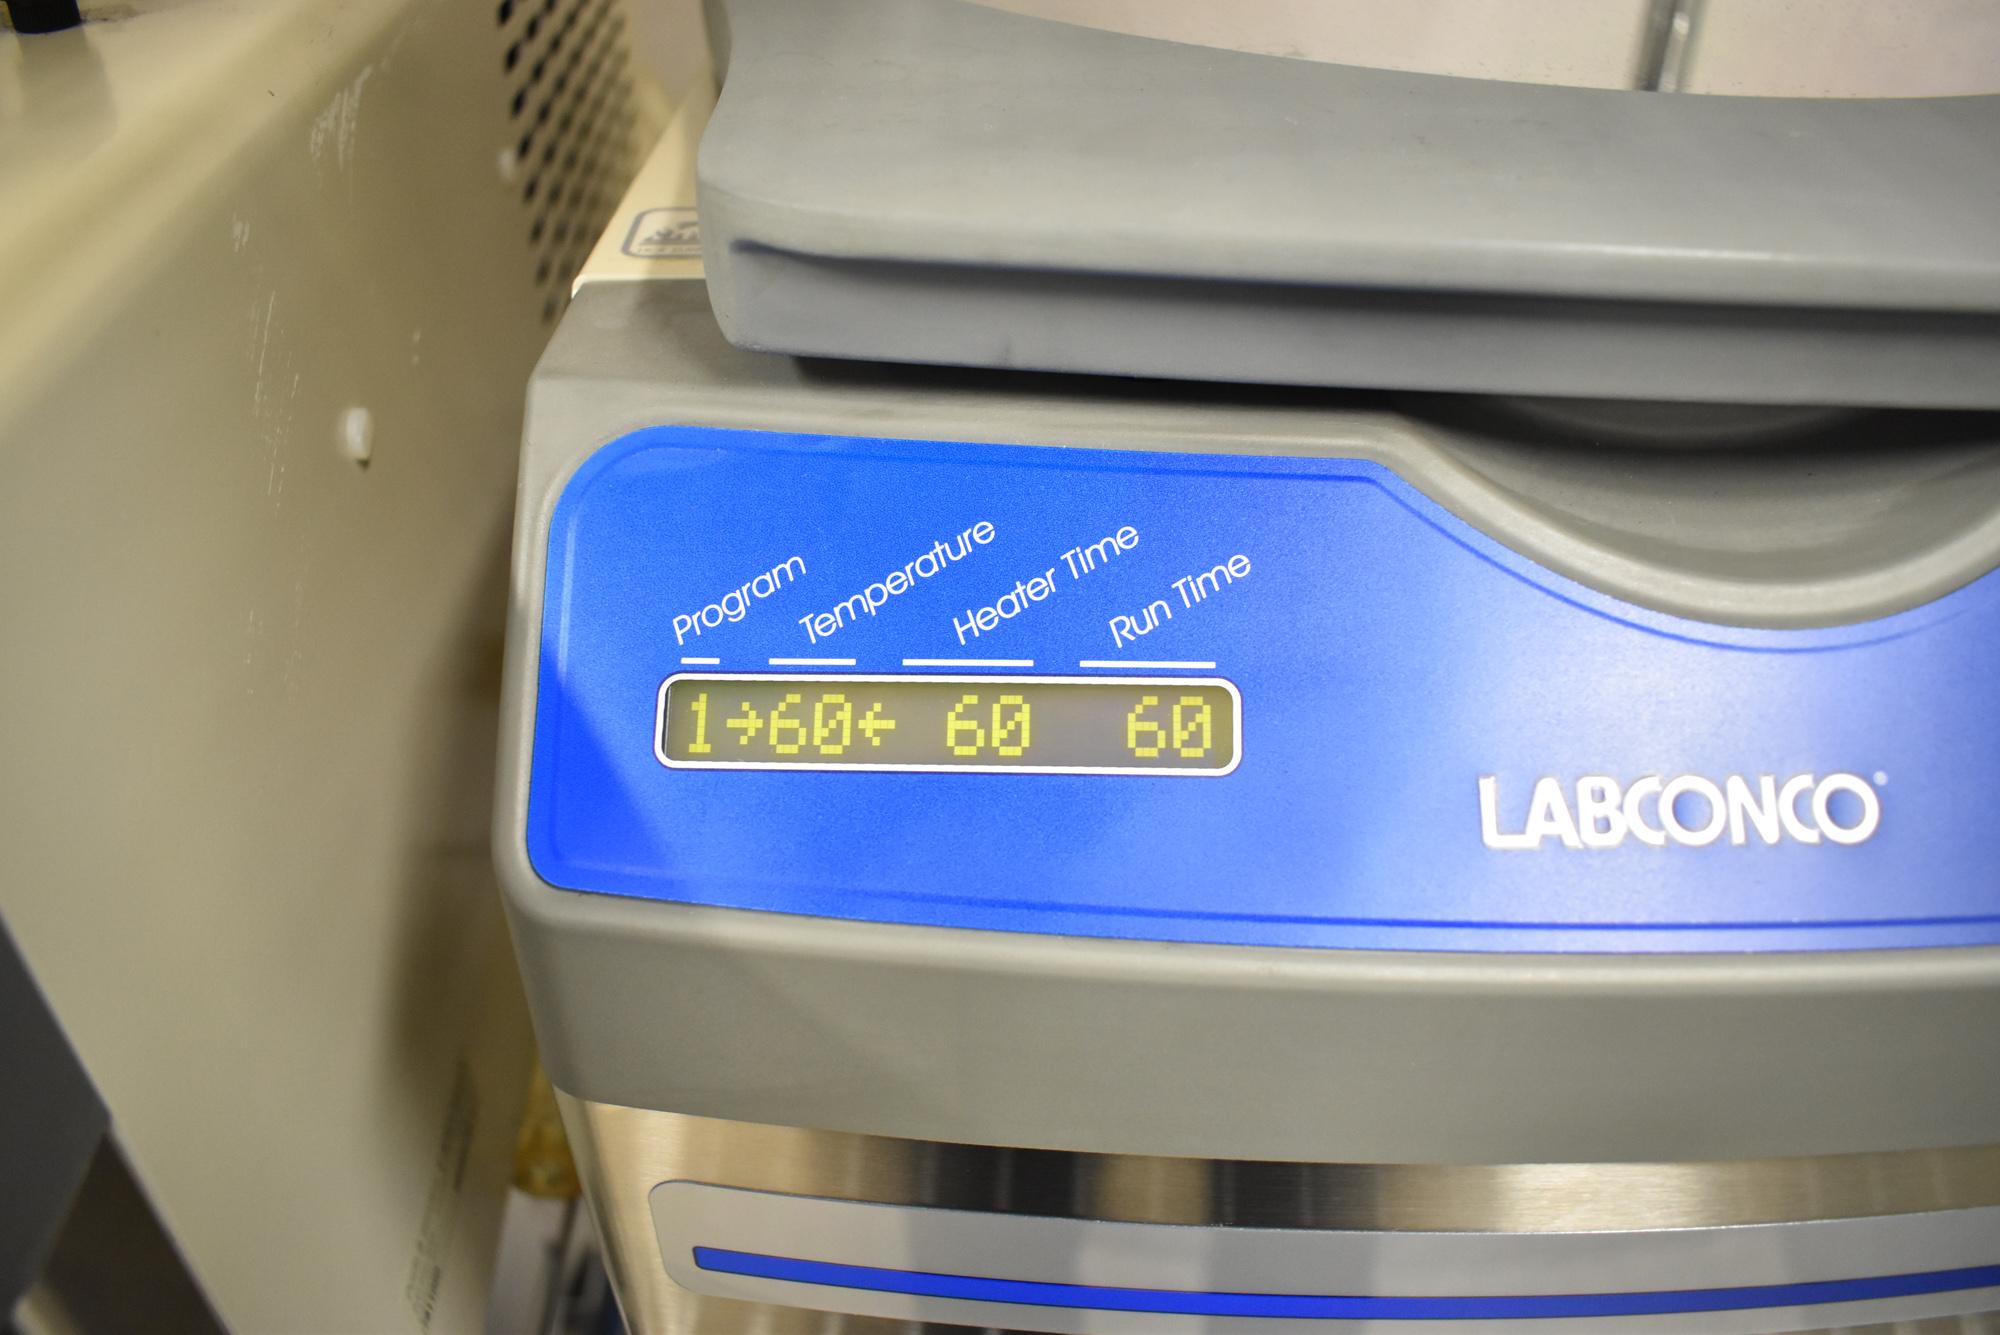 LABCONCO CENTRI-VAP CENTRIFUGAL CONCENTRATOR SYSTEM WITH LABCONCO CENTRIVAP COLD TRAP, ILMVAC - Image 2 of 14